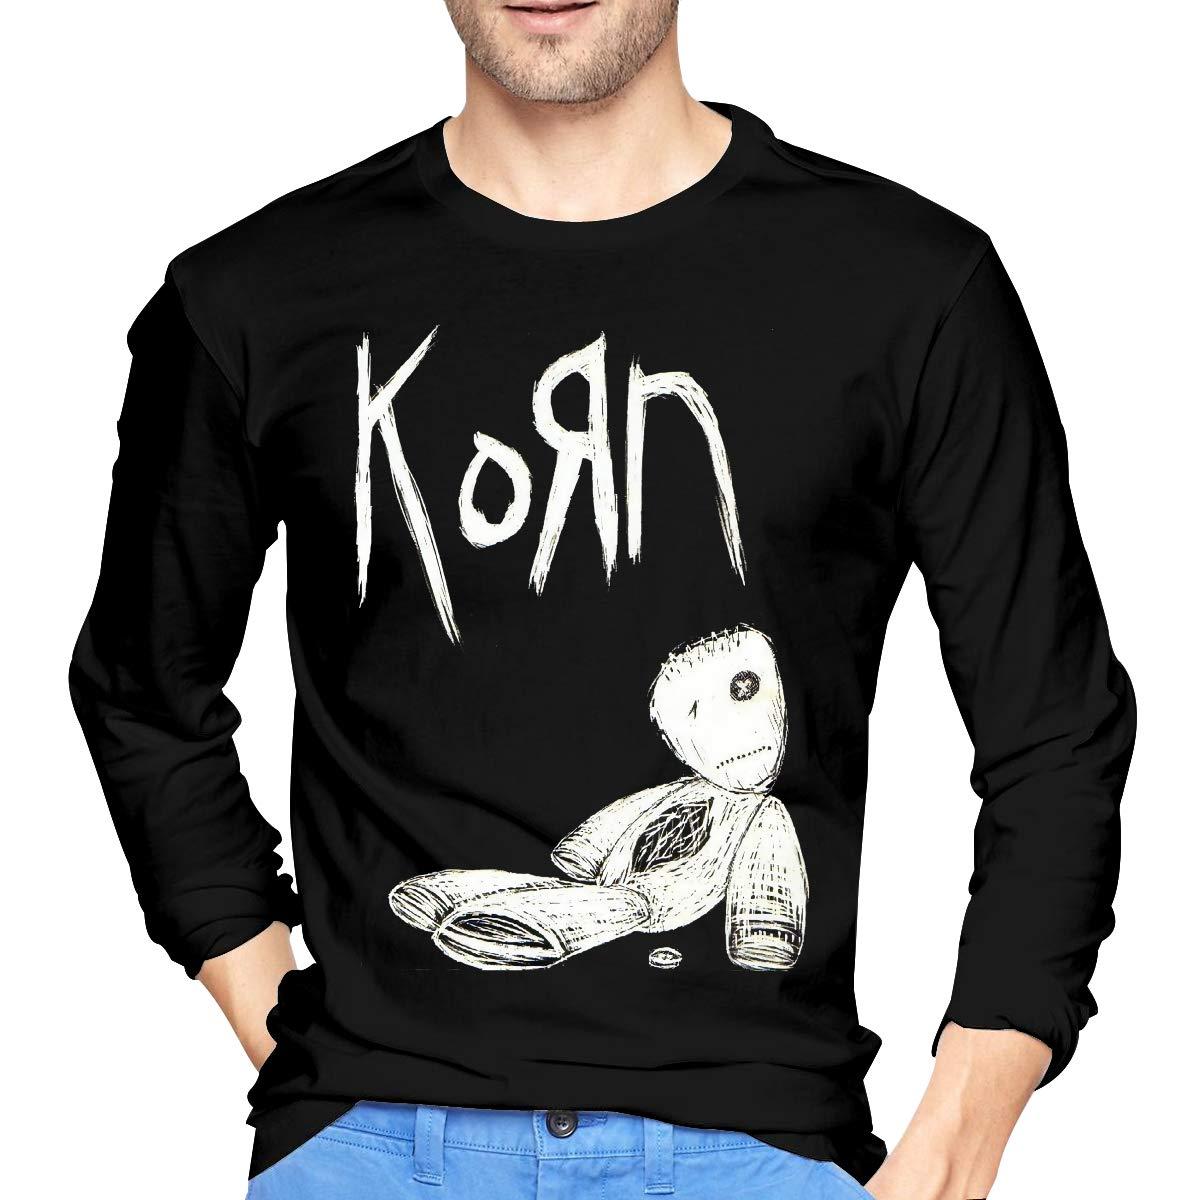 BXNOOD Mens Classic Korn Long Sleeve T-Shirts S Black